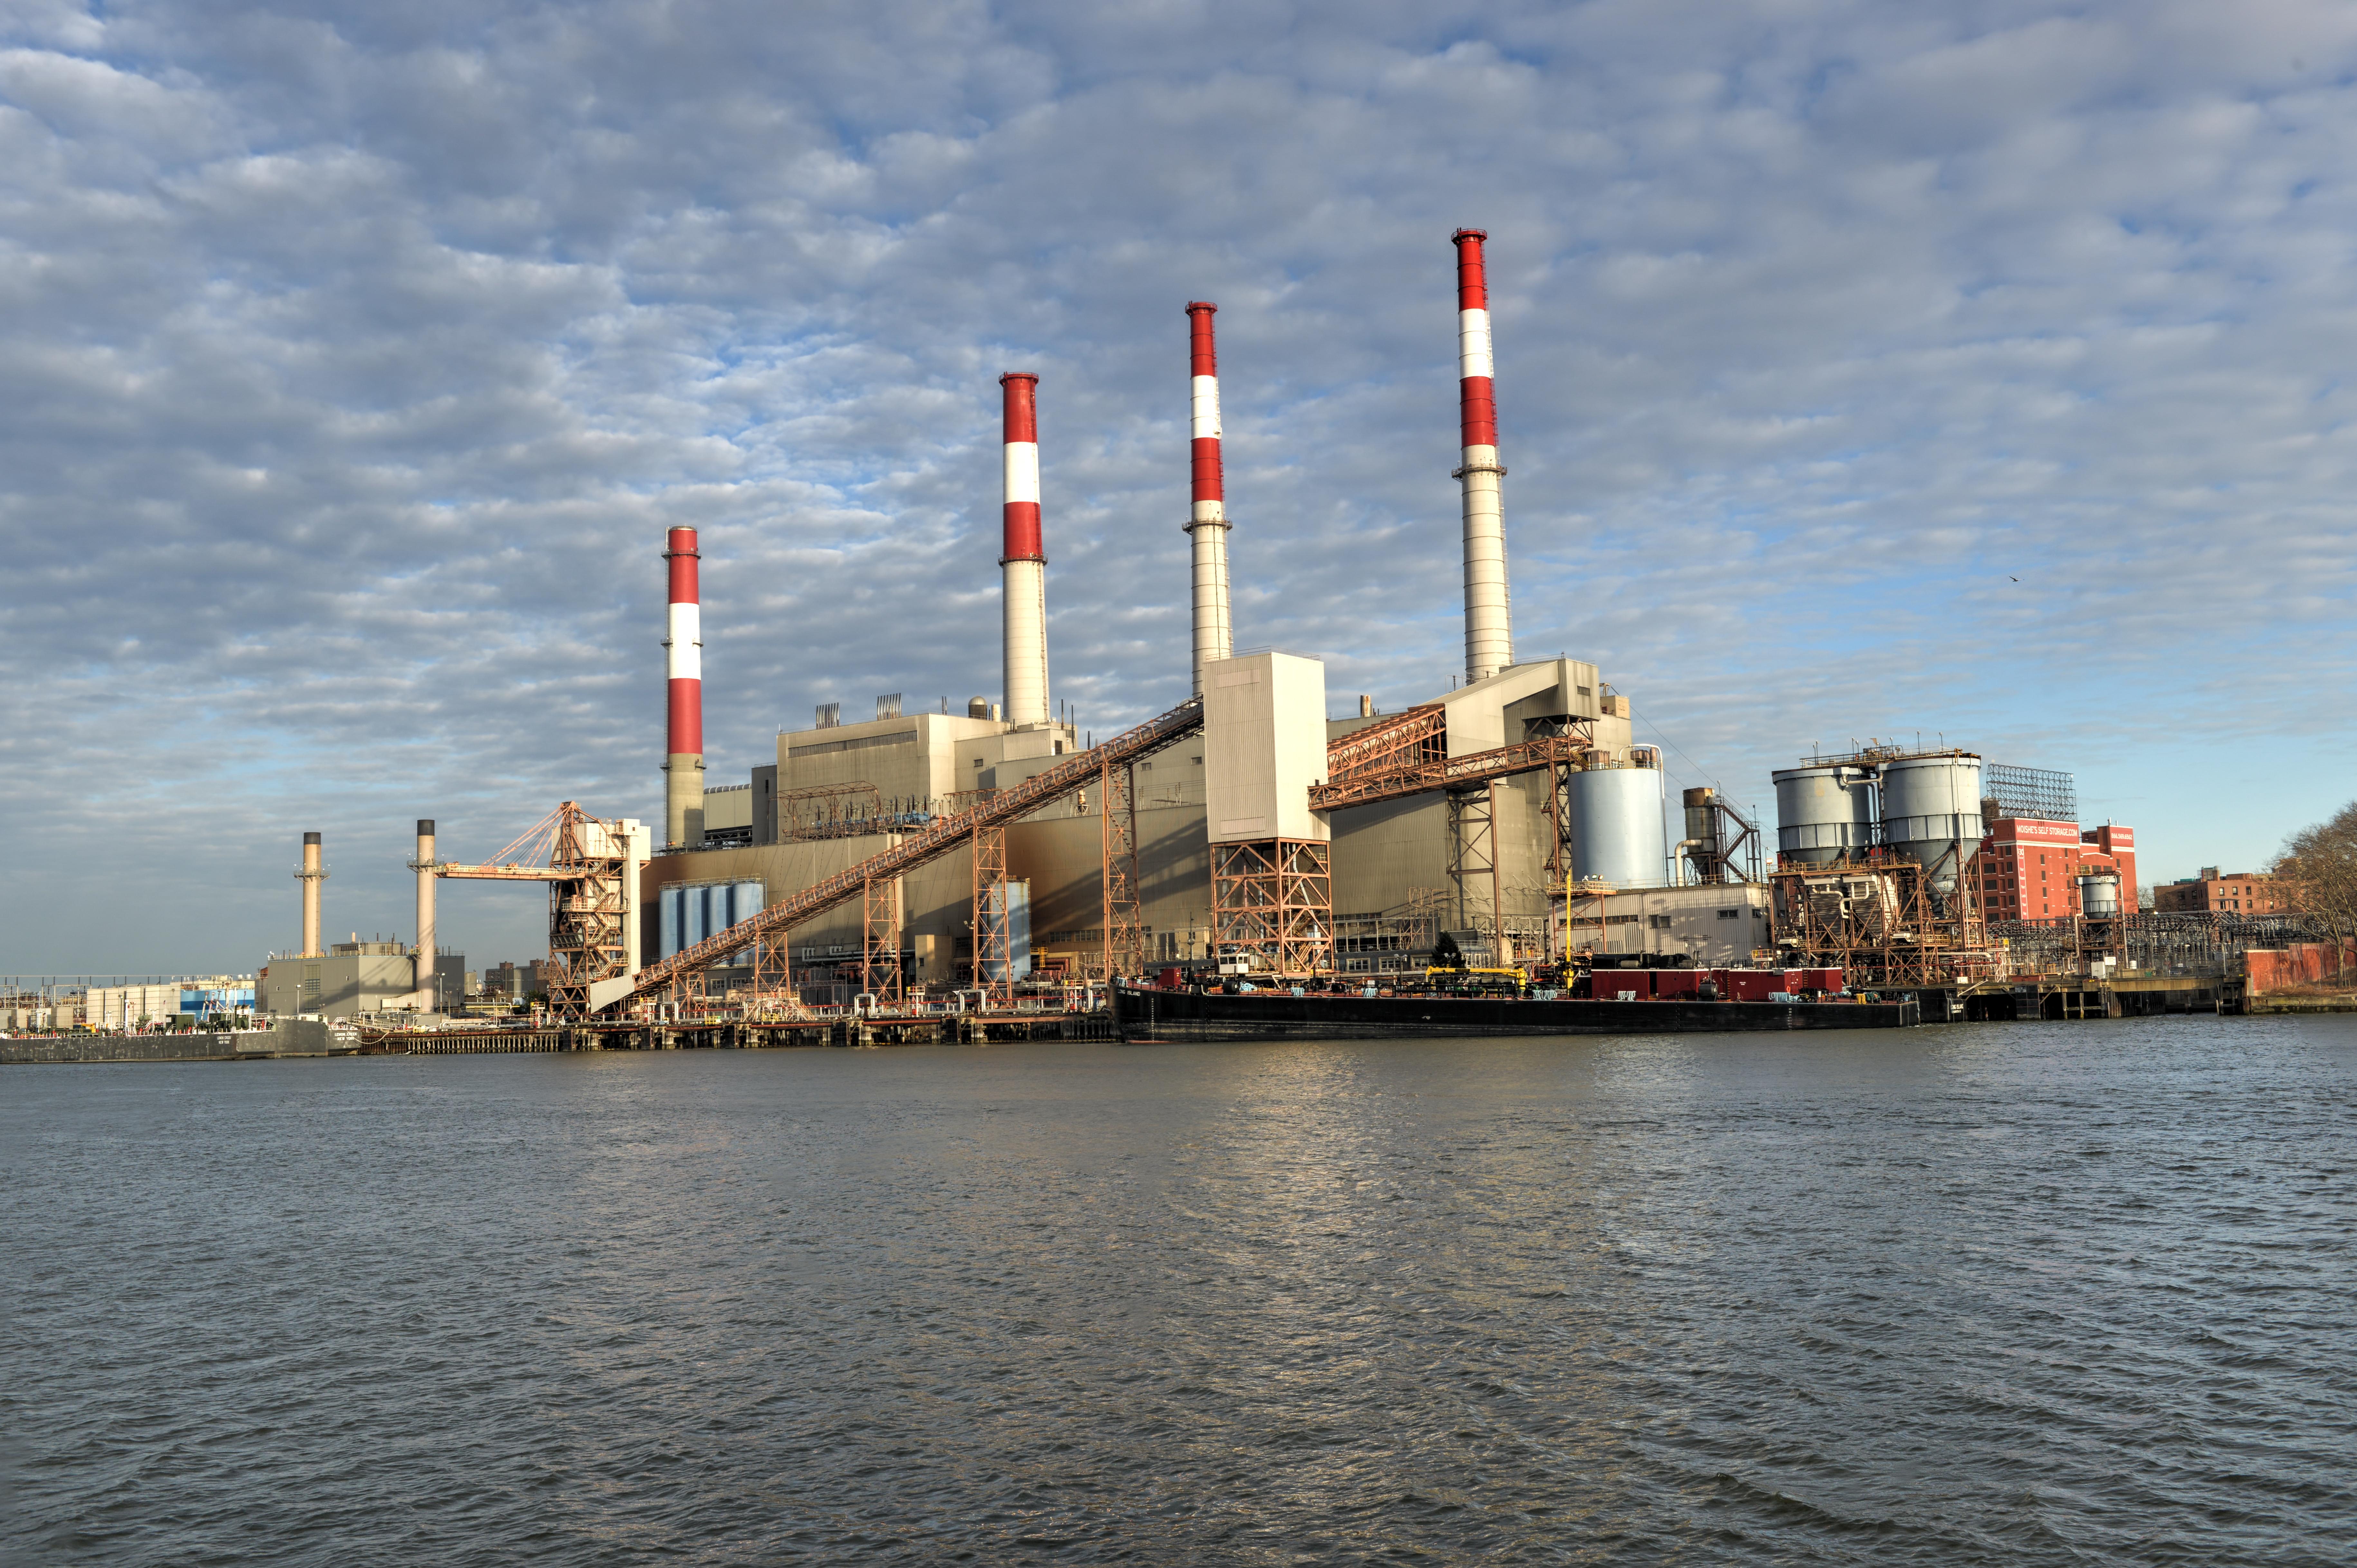 Ravenswood Generating Station in New York City. (Felix Lipov/Shutterstock)